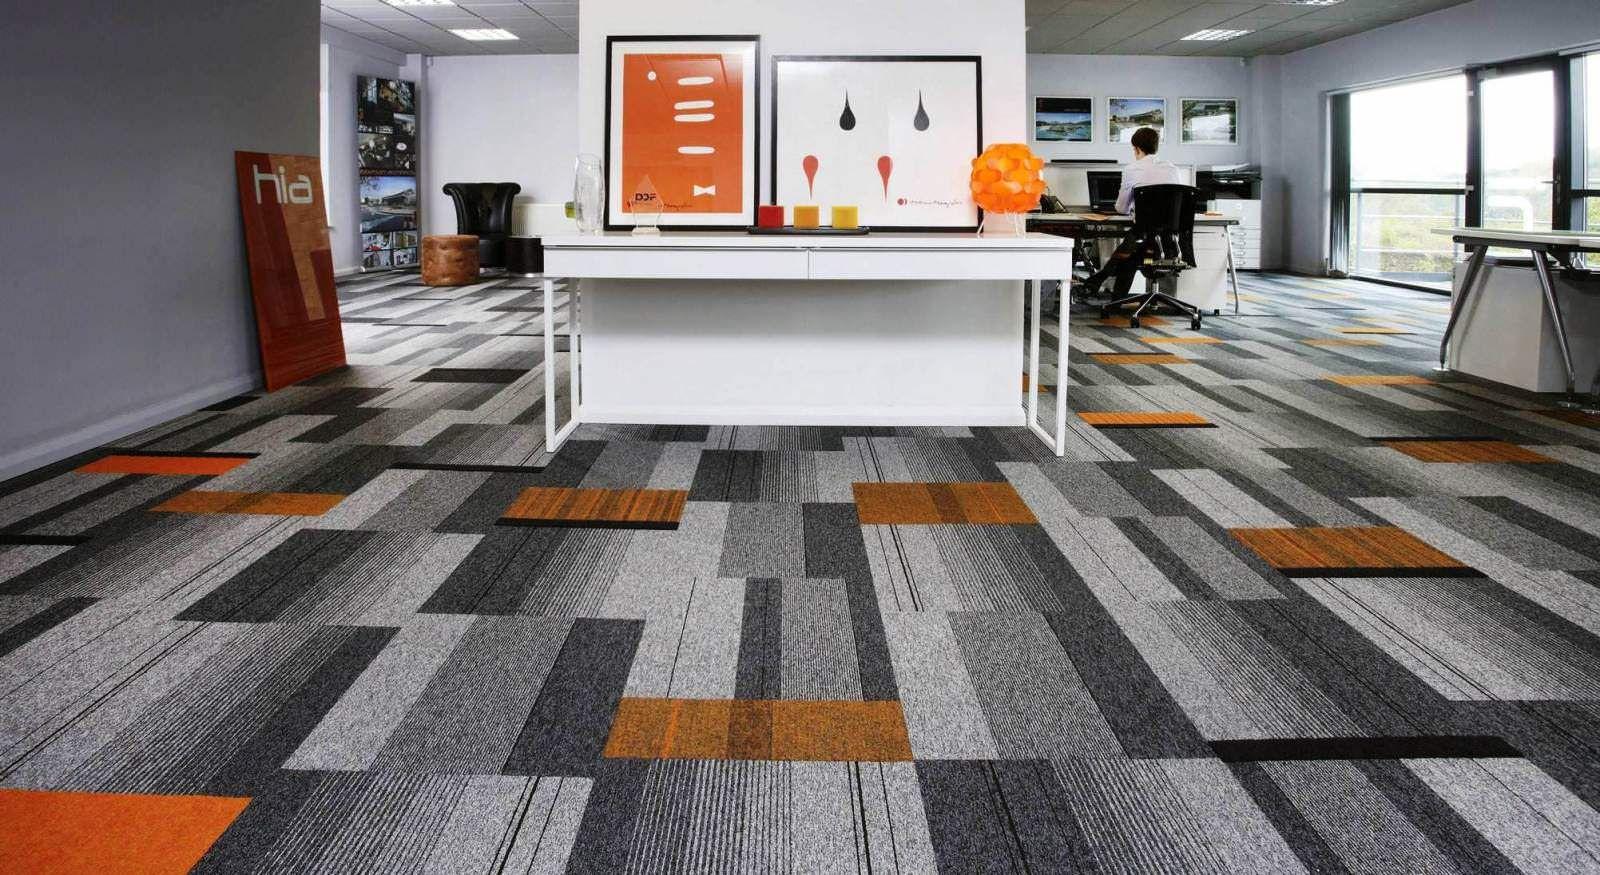 Office Carpet Tile Design Carpet Tiles Office Carpet Tiles